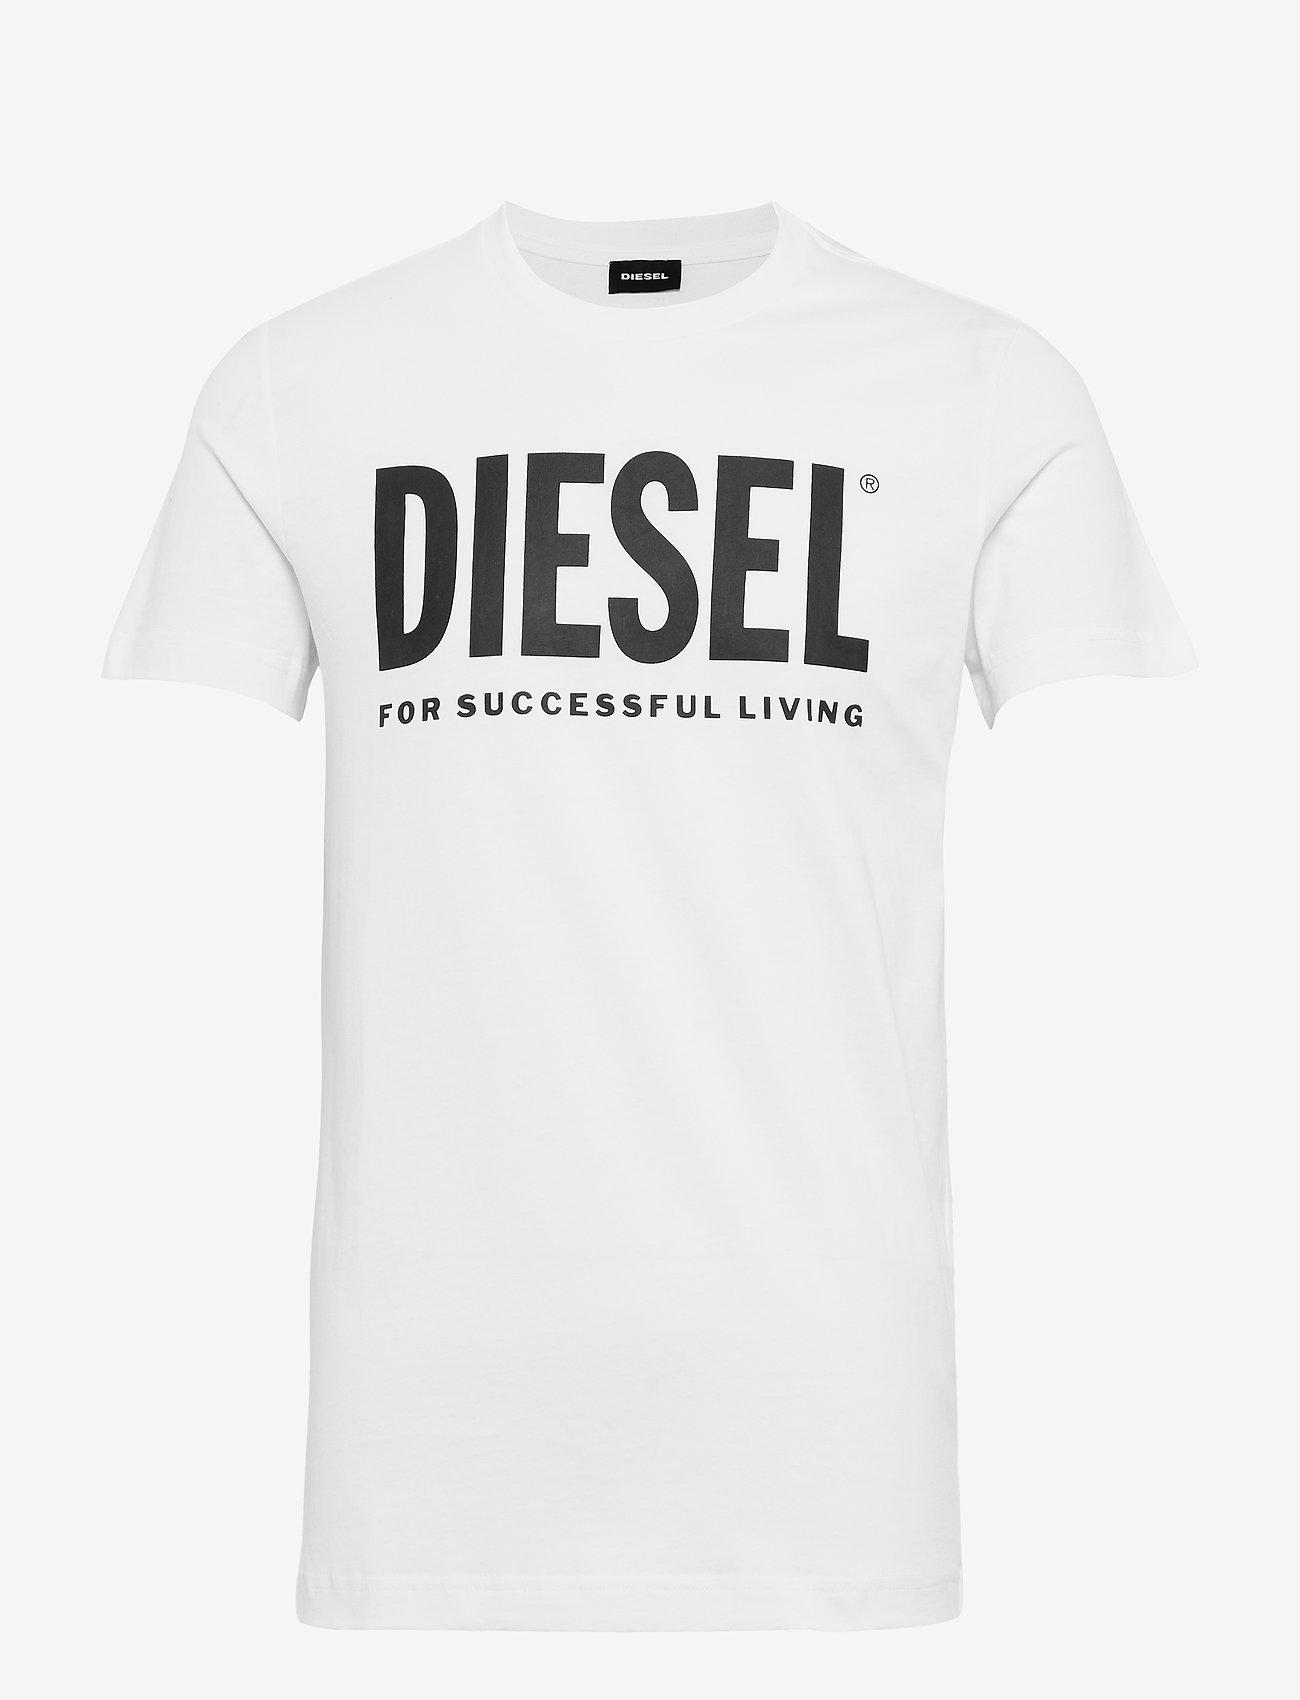 Diesel Men - T-DIEGO-LOGO T-SHIRT - short-sleeved t-shirts - bright white - 0